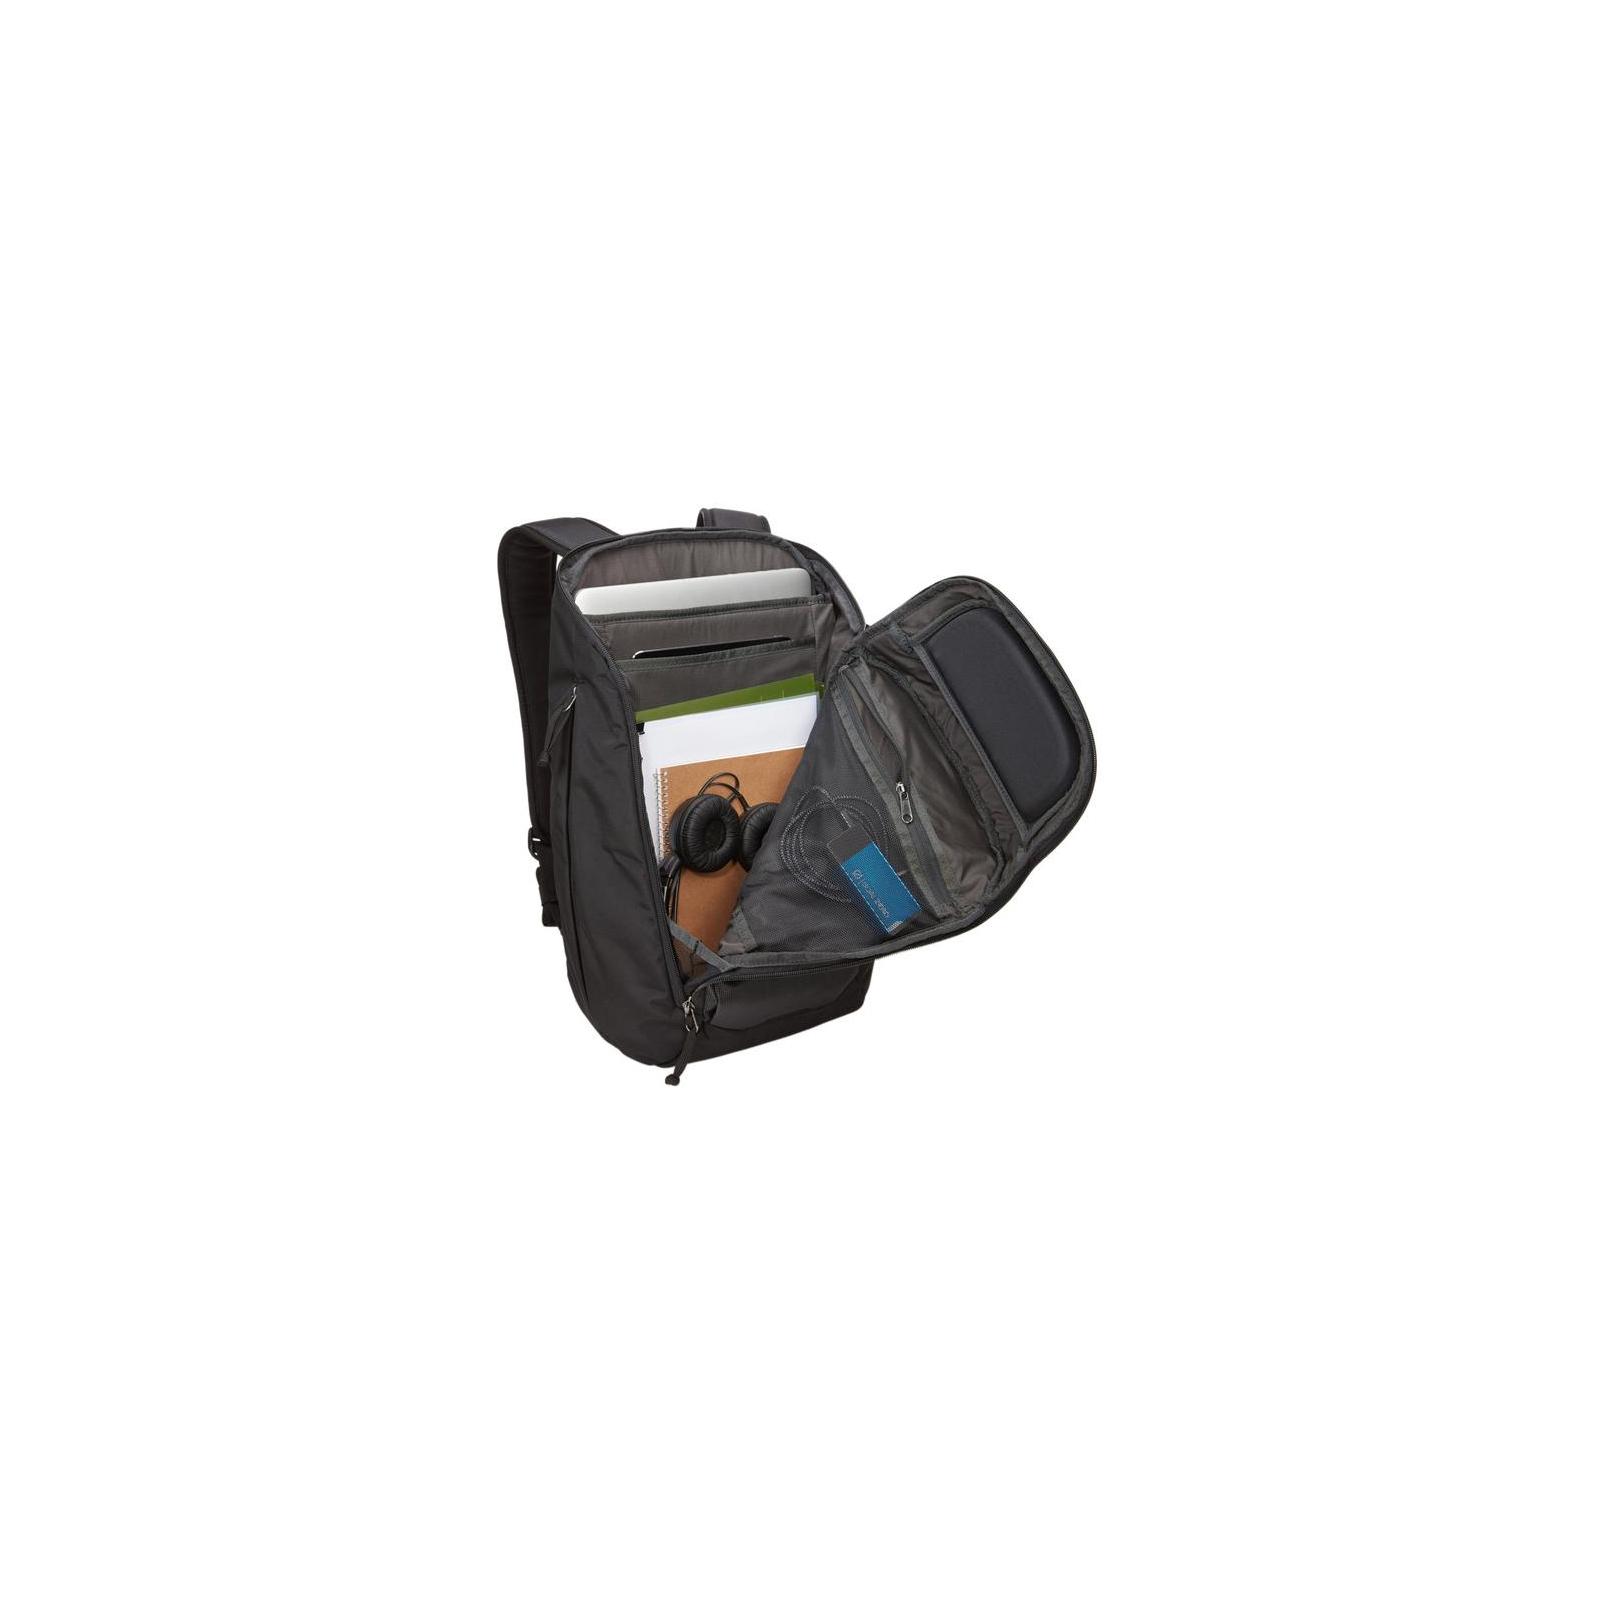 "Рюкзак для ноутбука Thule 15.6"" EnRoute 23L TEBP-316 Asphalt (3203830) изображение 4"